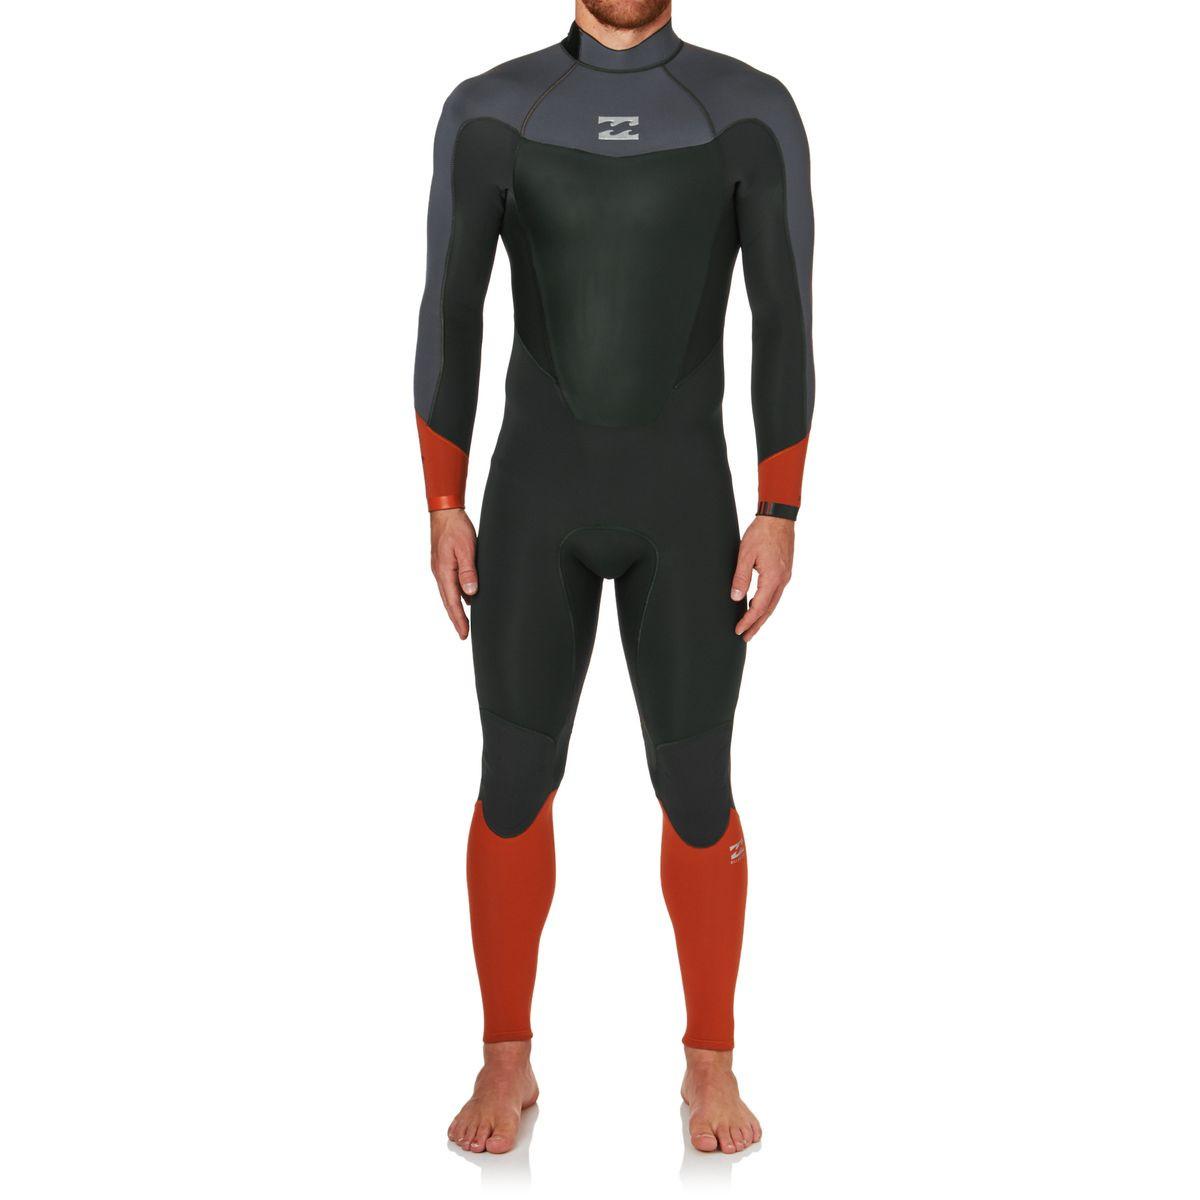 Billabong Absolute Comp 3/2mm 2017 Back Zip Wetsuit - Orange